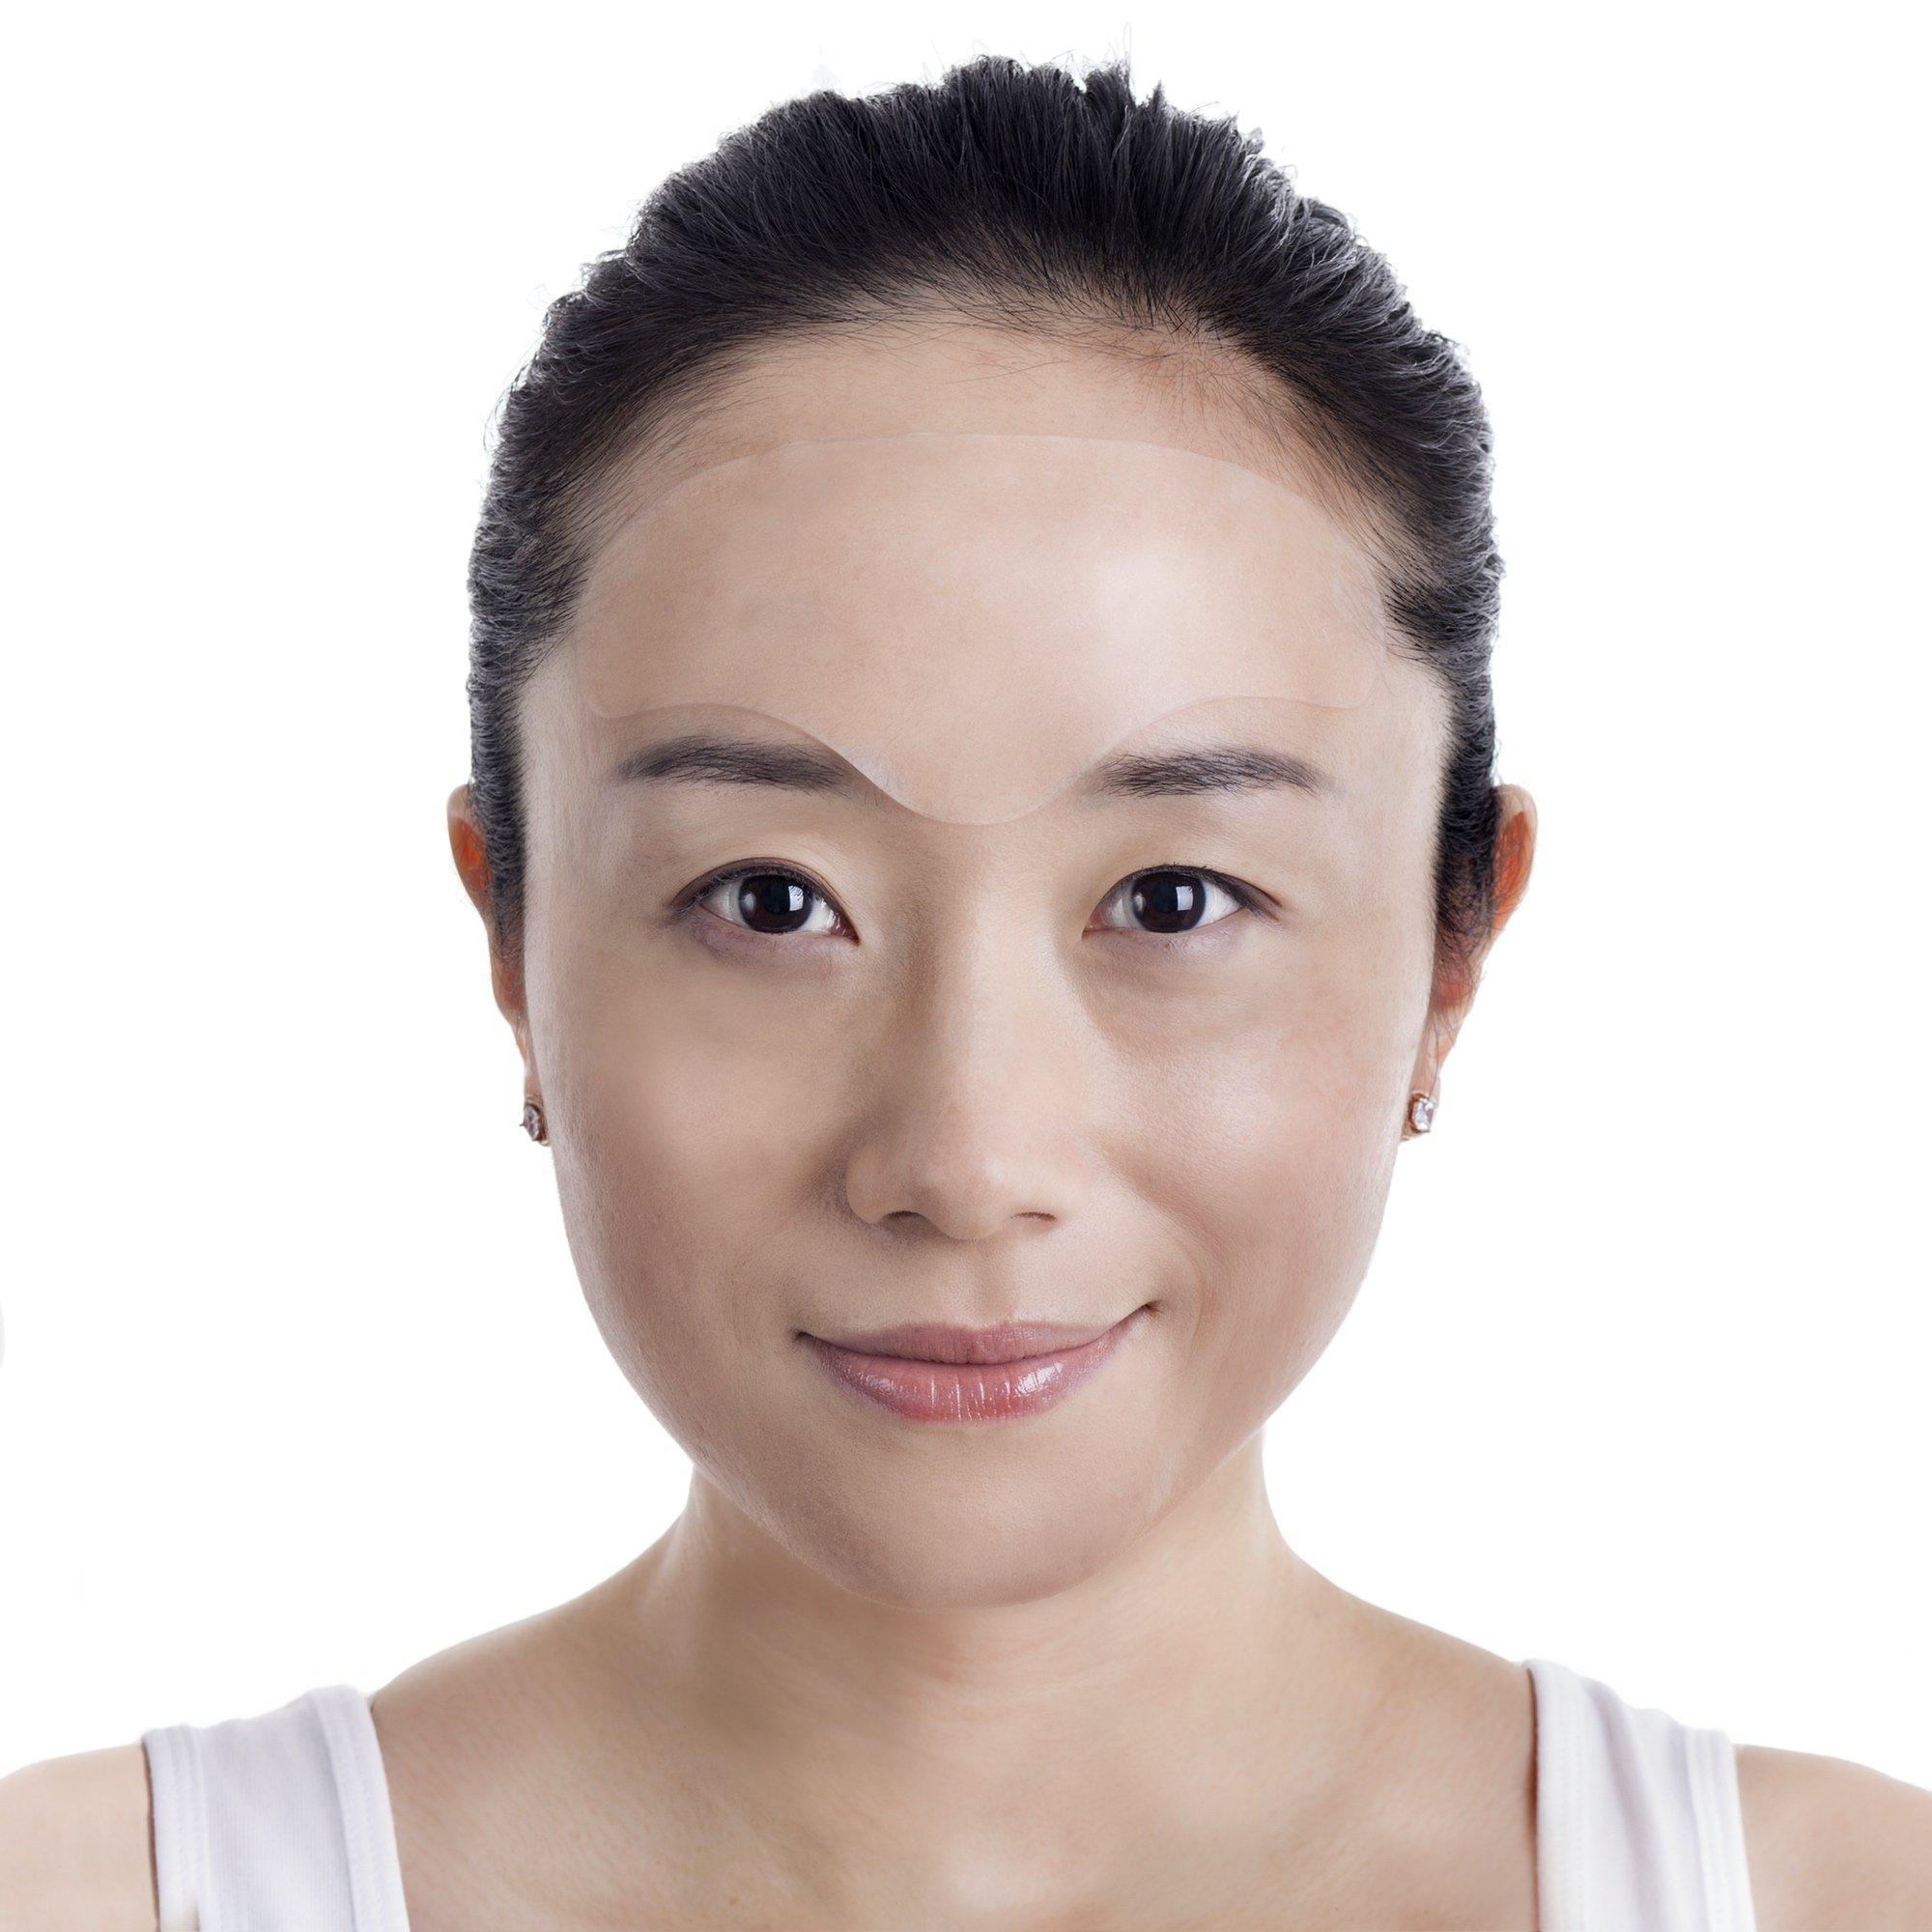 Forehead Smoothing Kit - Wrinkles Schminkles 4